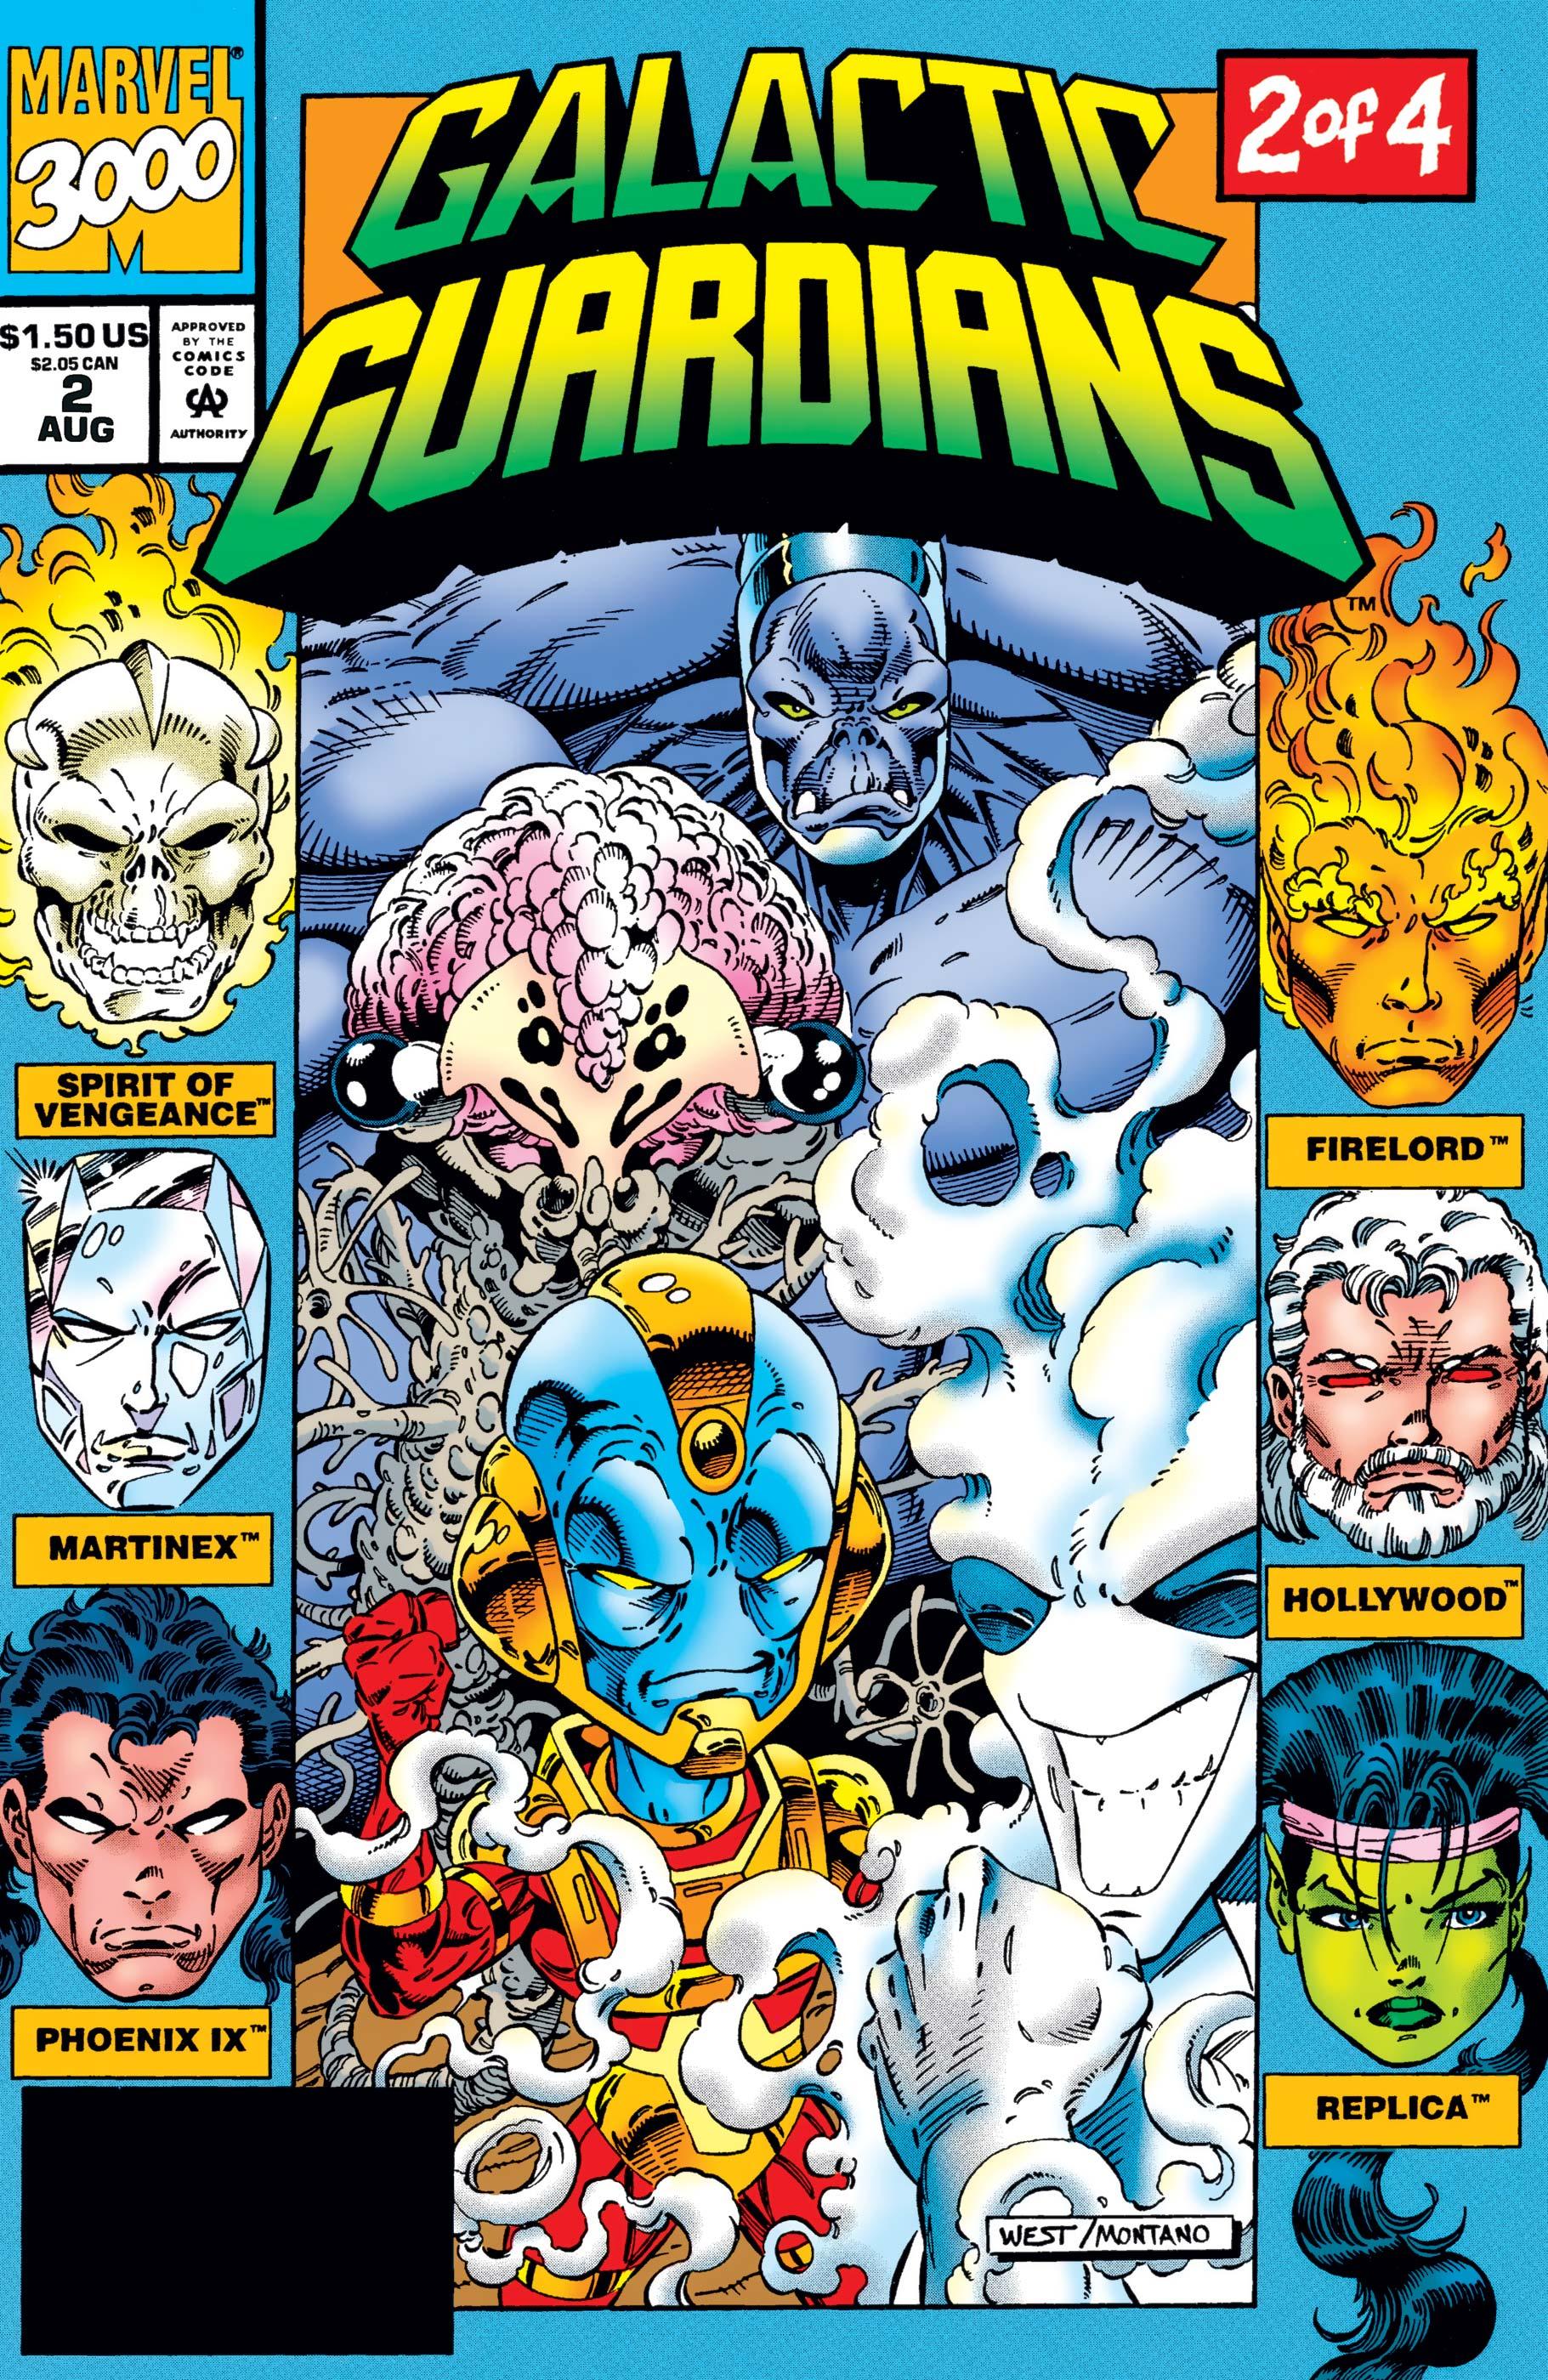 Galactic Guardians (1994) #2